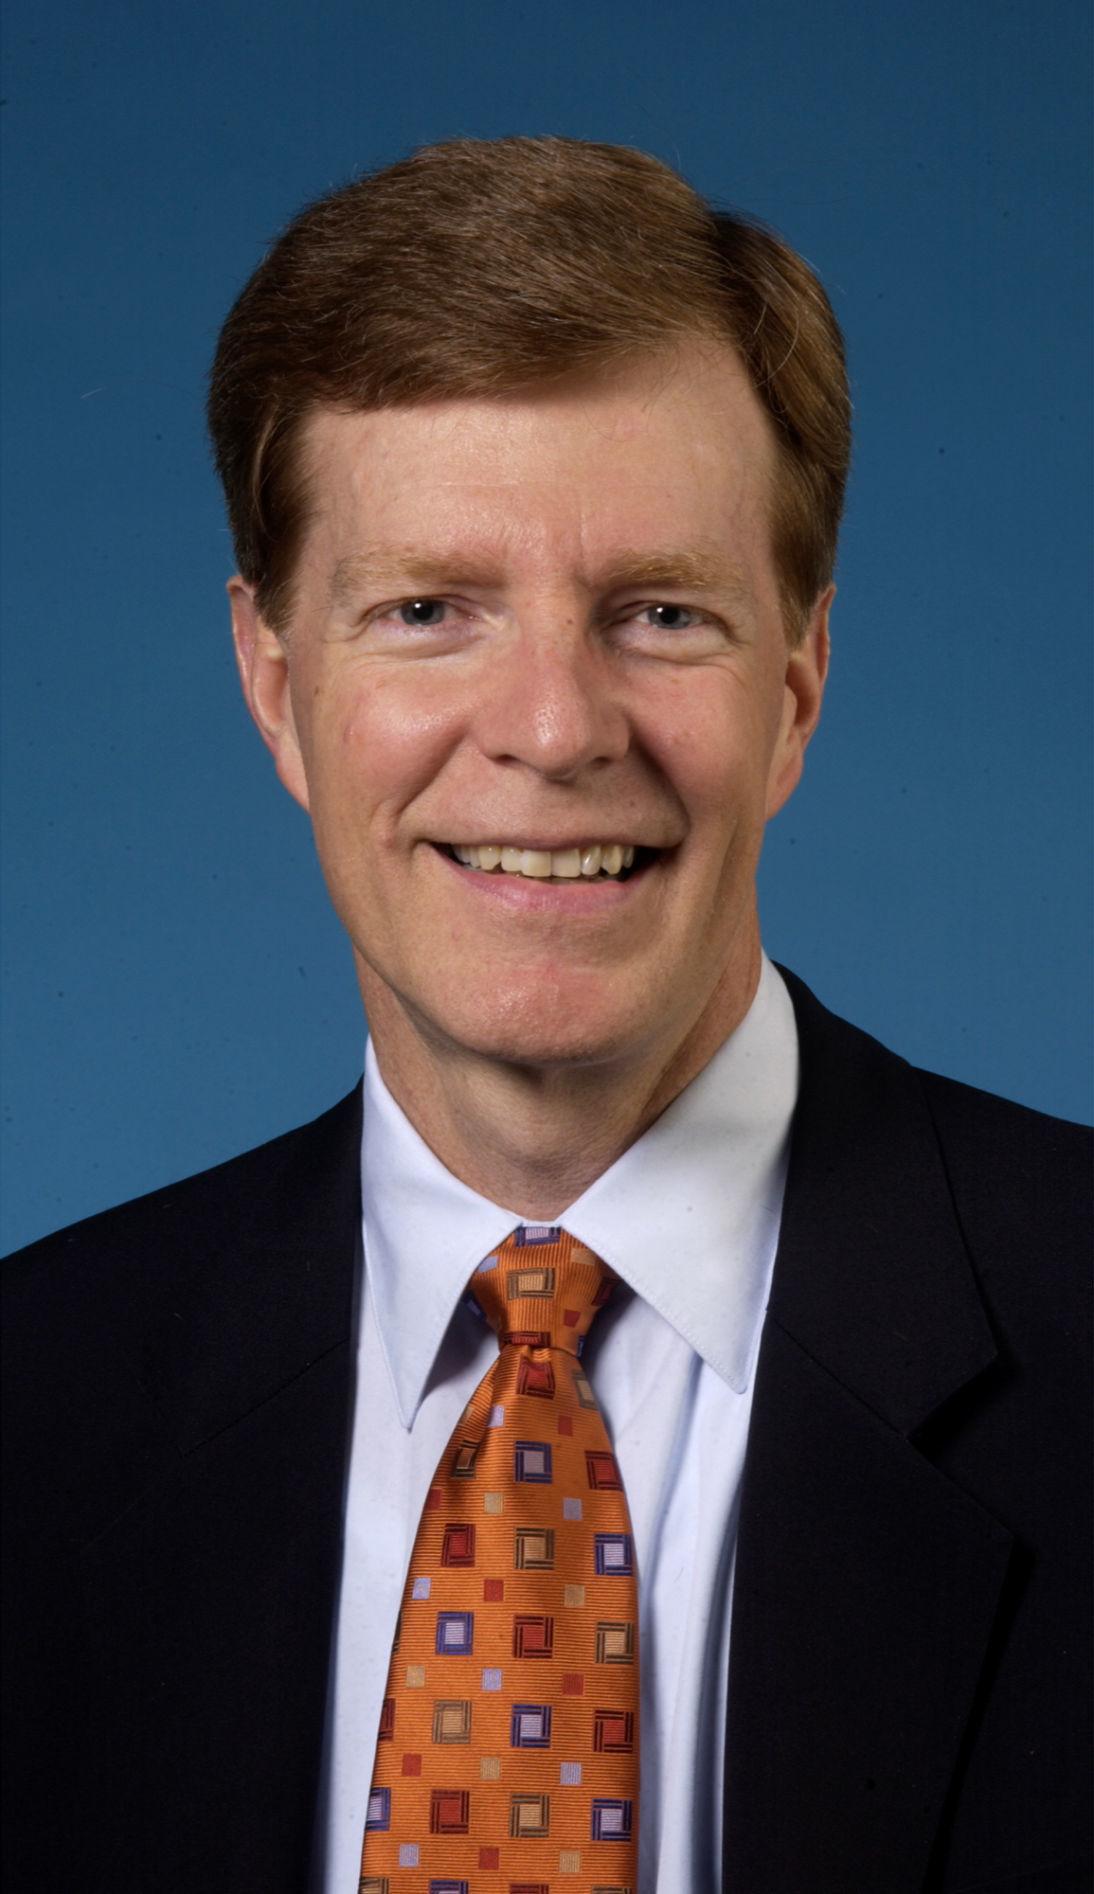 Jeff Neubauer